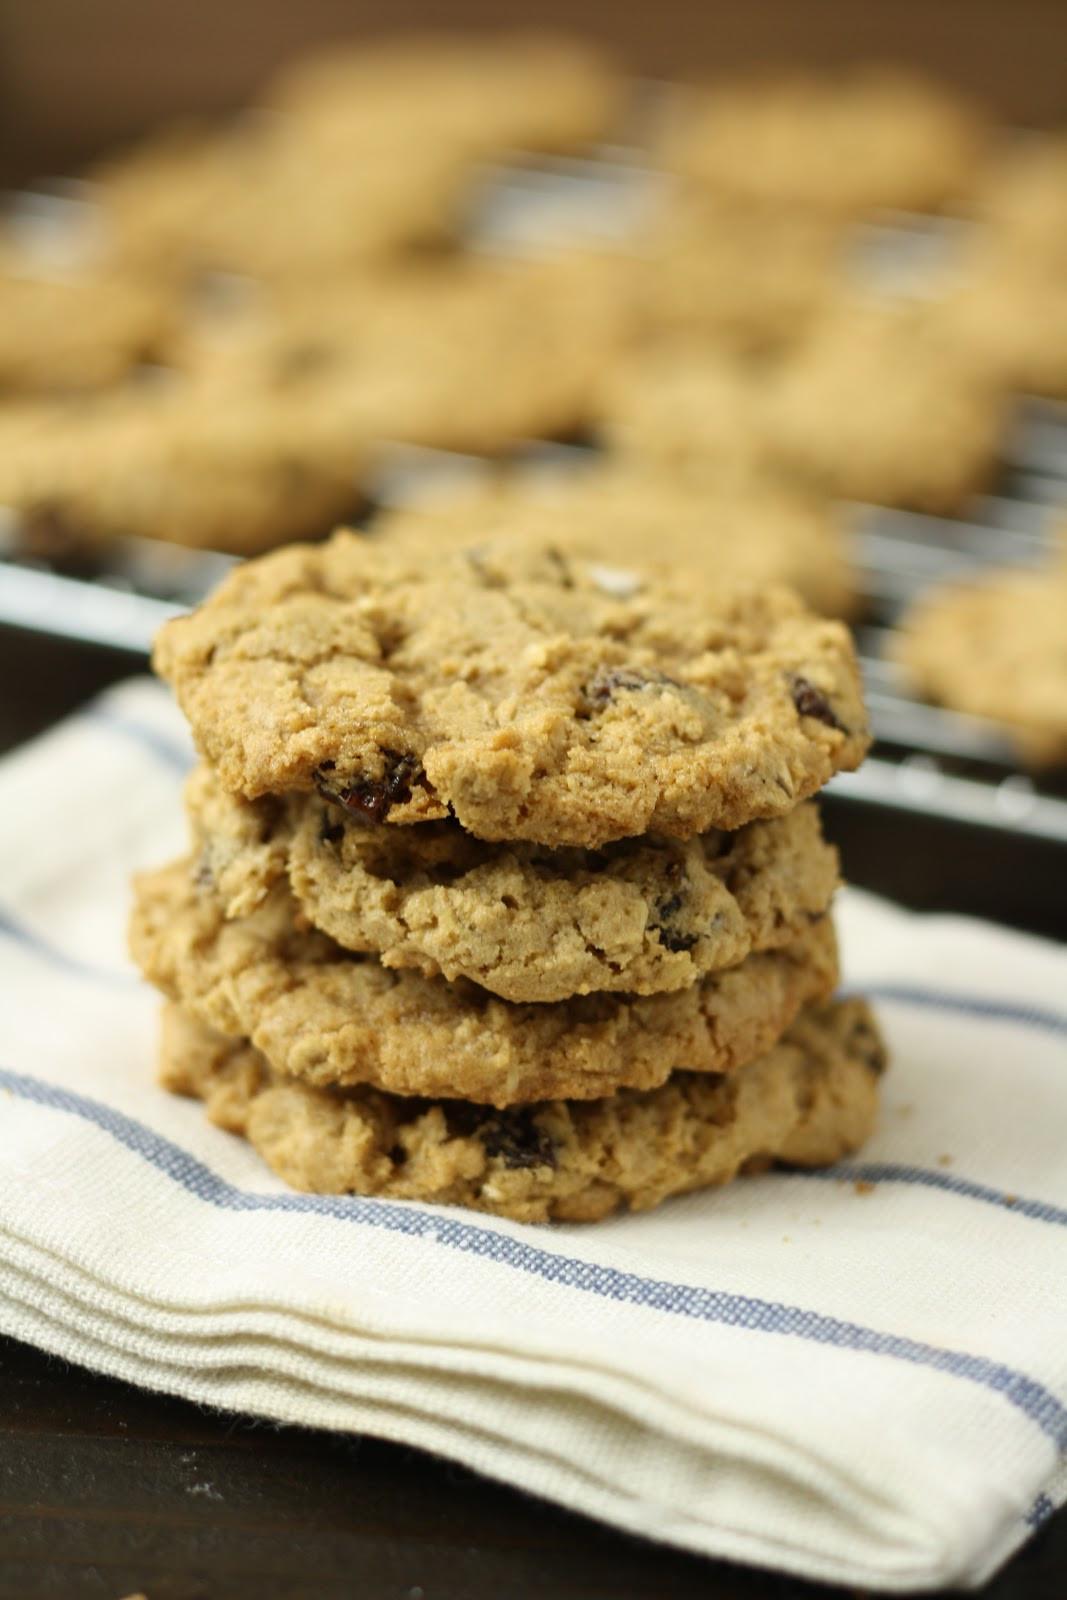 Gluten Free Recipes Dessert  Gluten Free Dessert Recipes for National Oatmeal Cookie